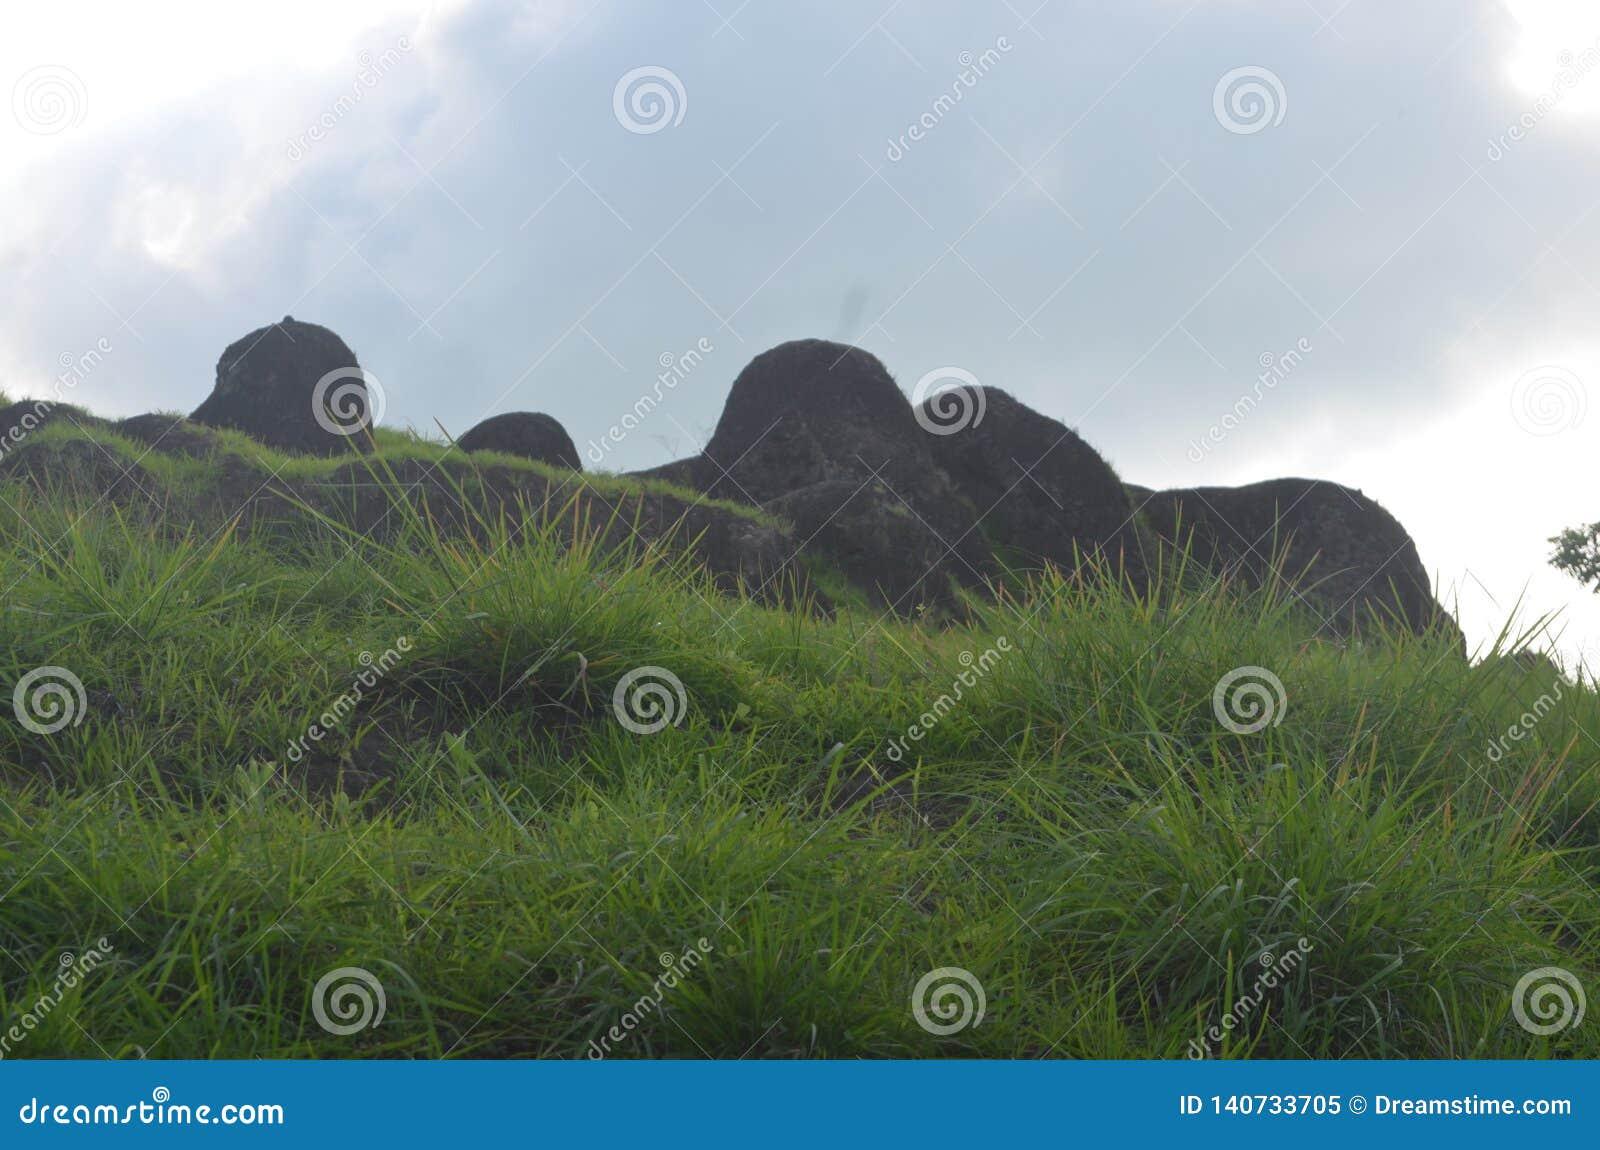 rocky mountain with very green grass around the island of Dewata Bali